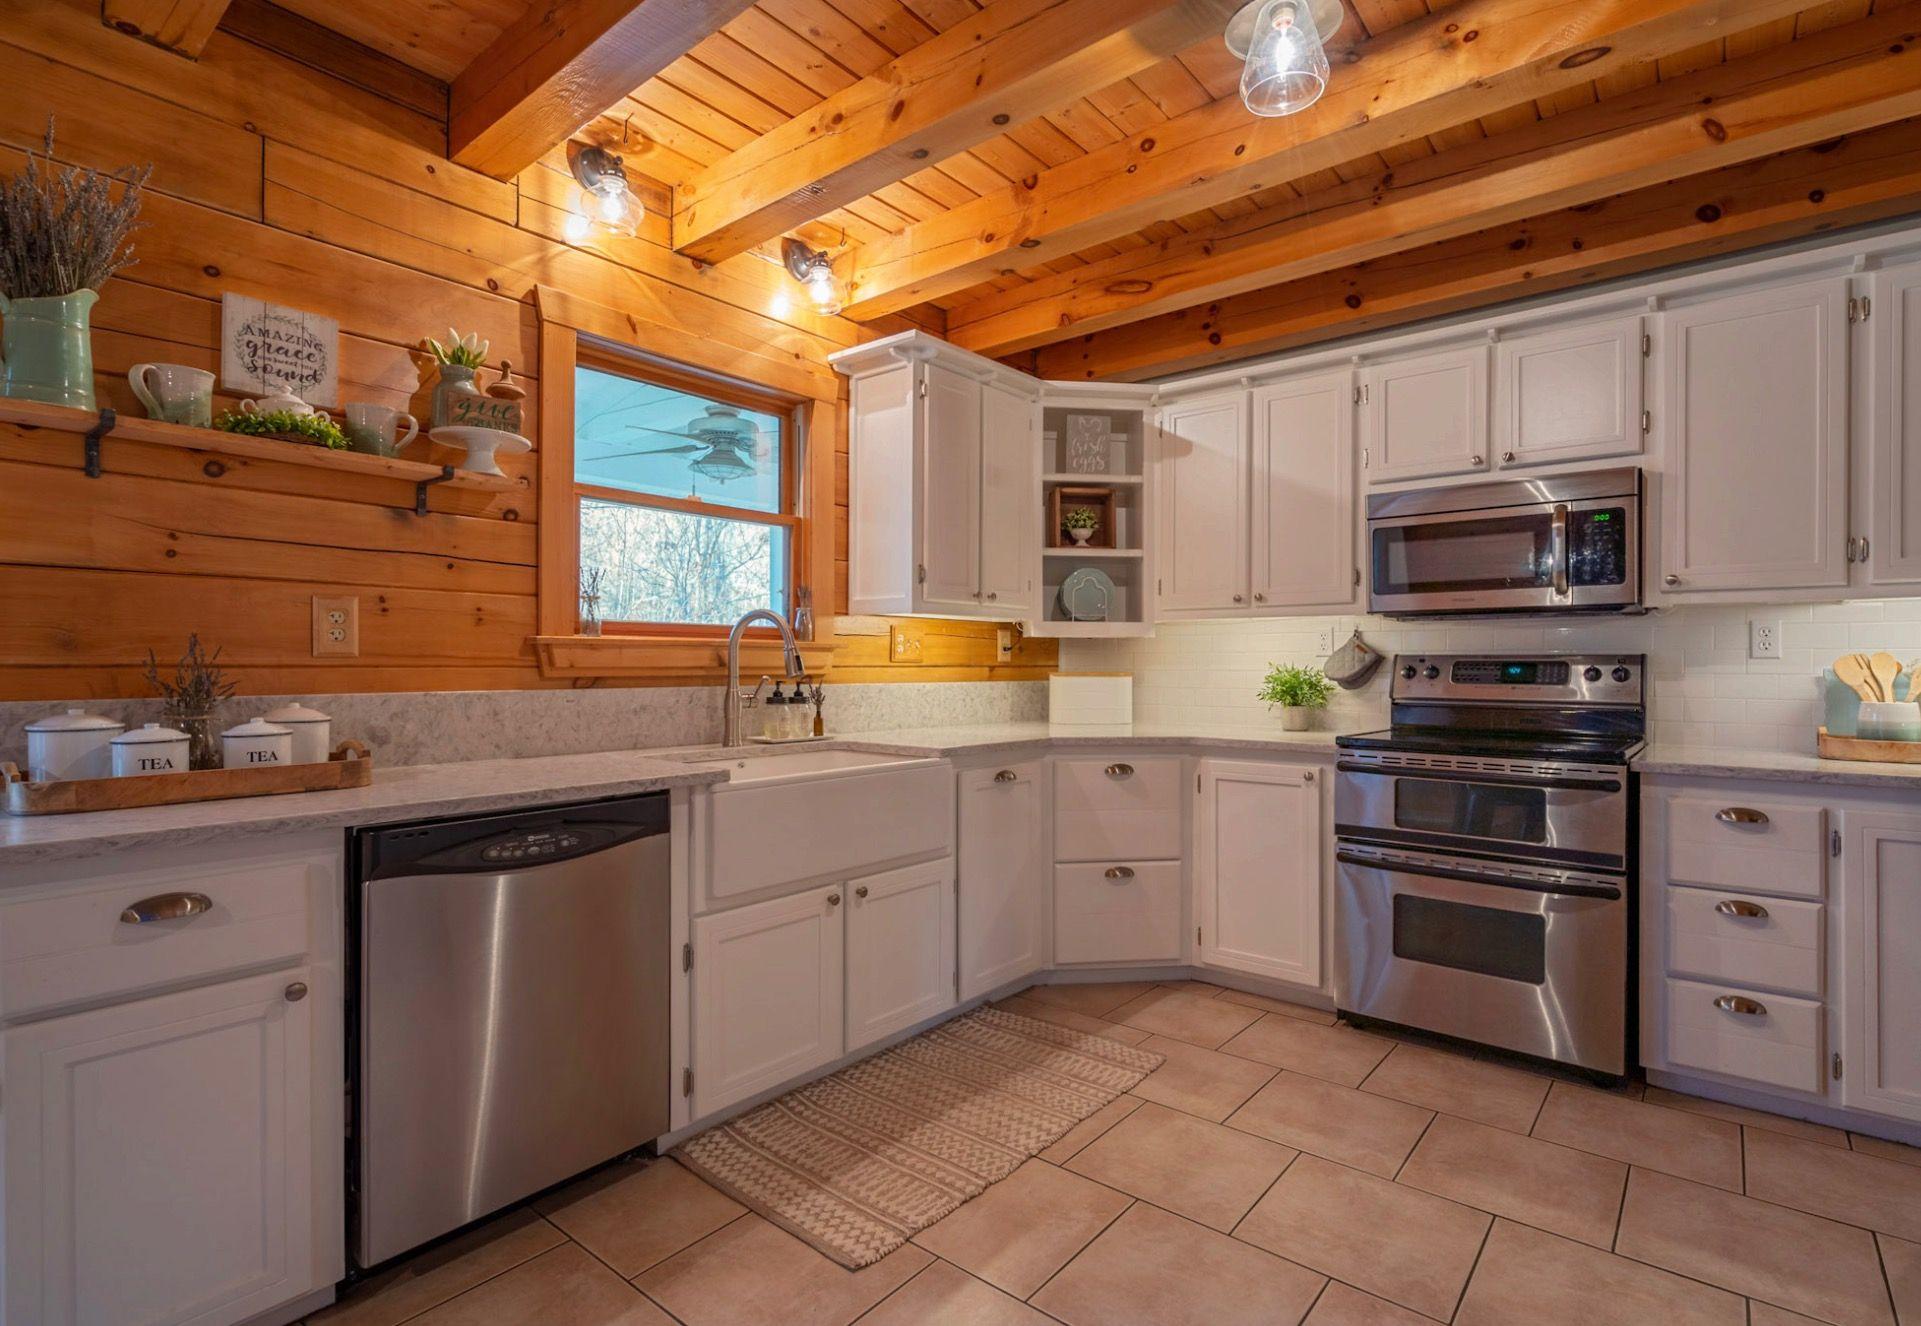 Farmhouse Cabin Kitchen White Cabinets Subway Tile Kitchen Dining Room Kitchen White Kitchen Cabinets